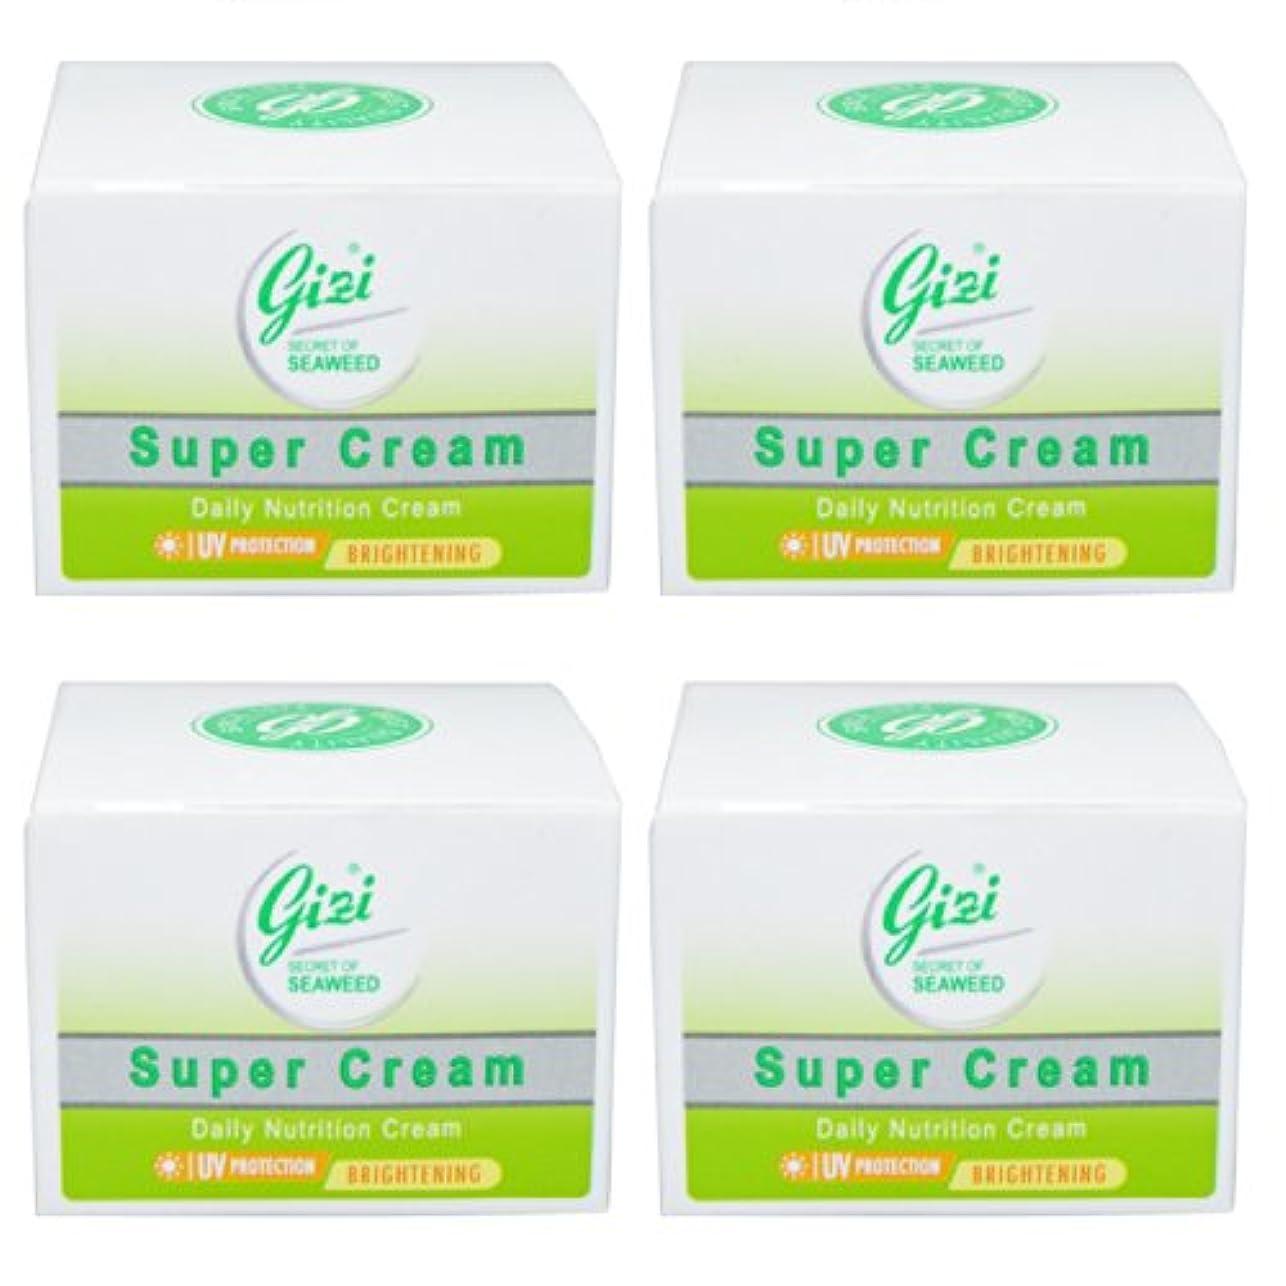 GIZI Super Cream(ギジ スーパークリーム)フェイスクリーム9g 4個セット[並行輸入品][海外直送品]